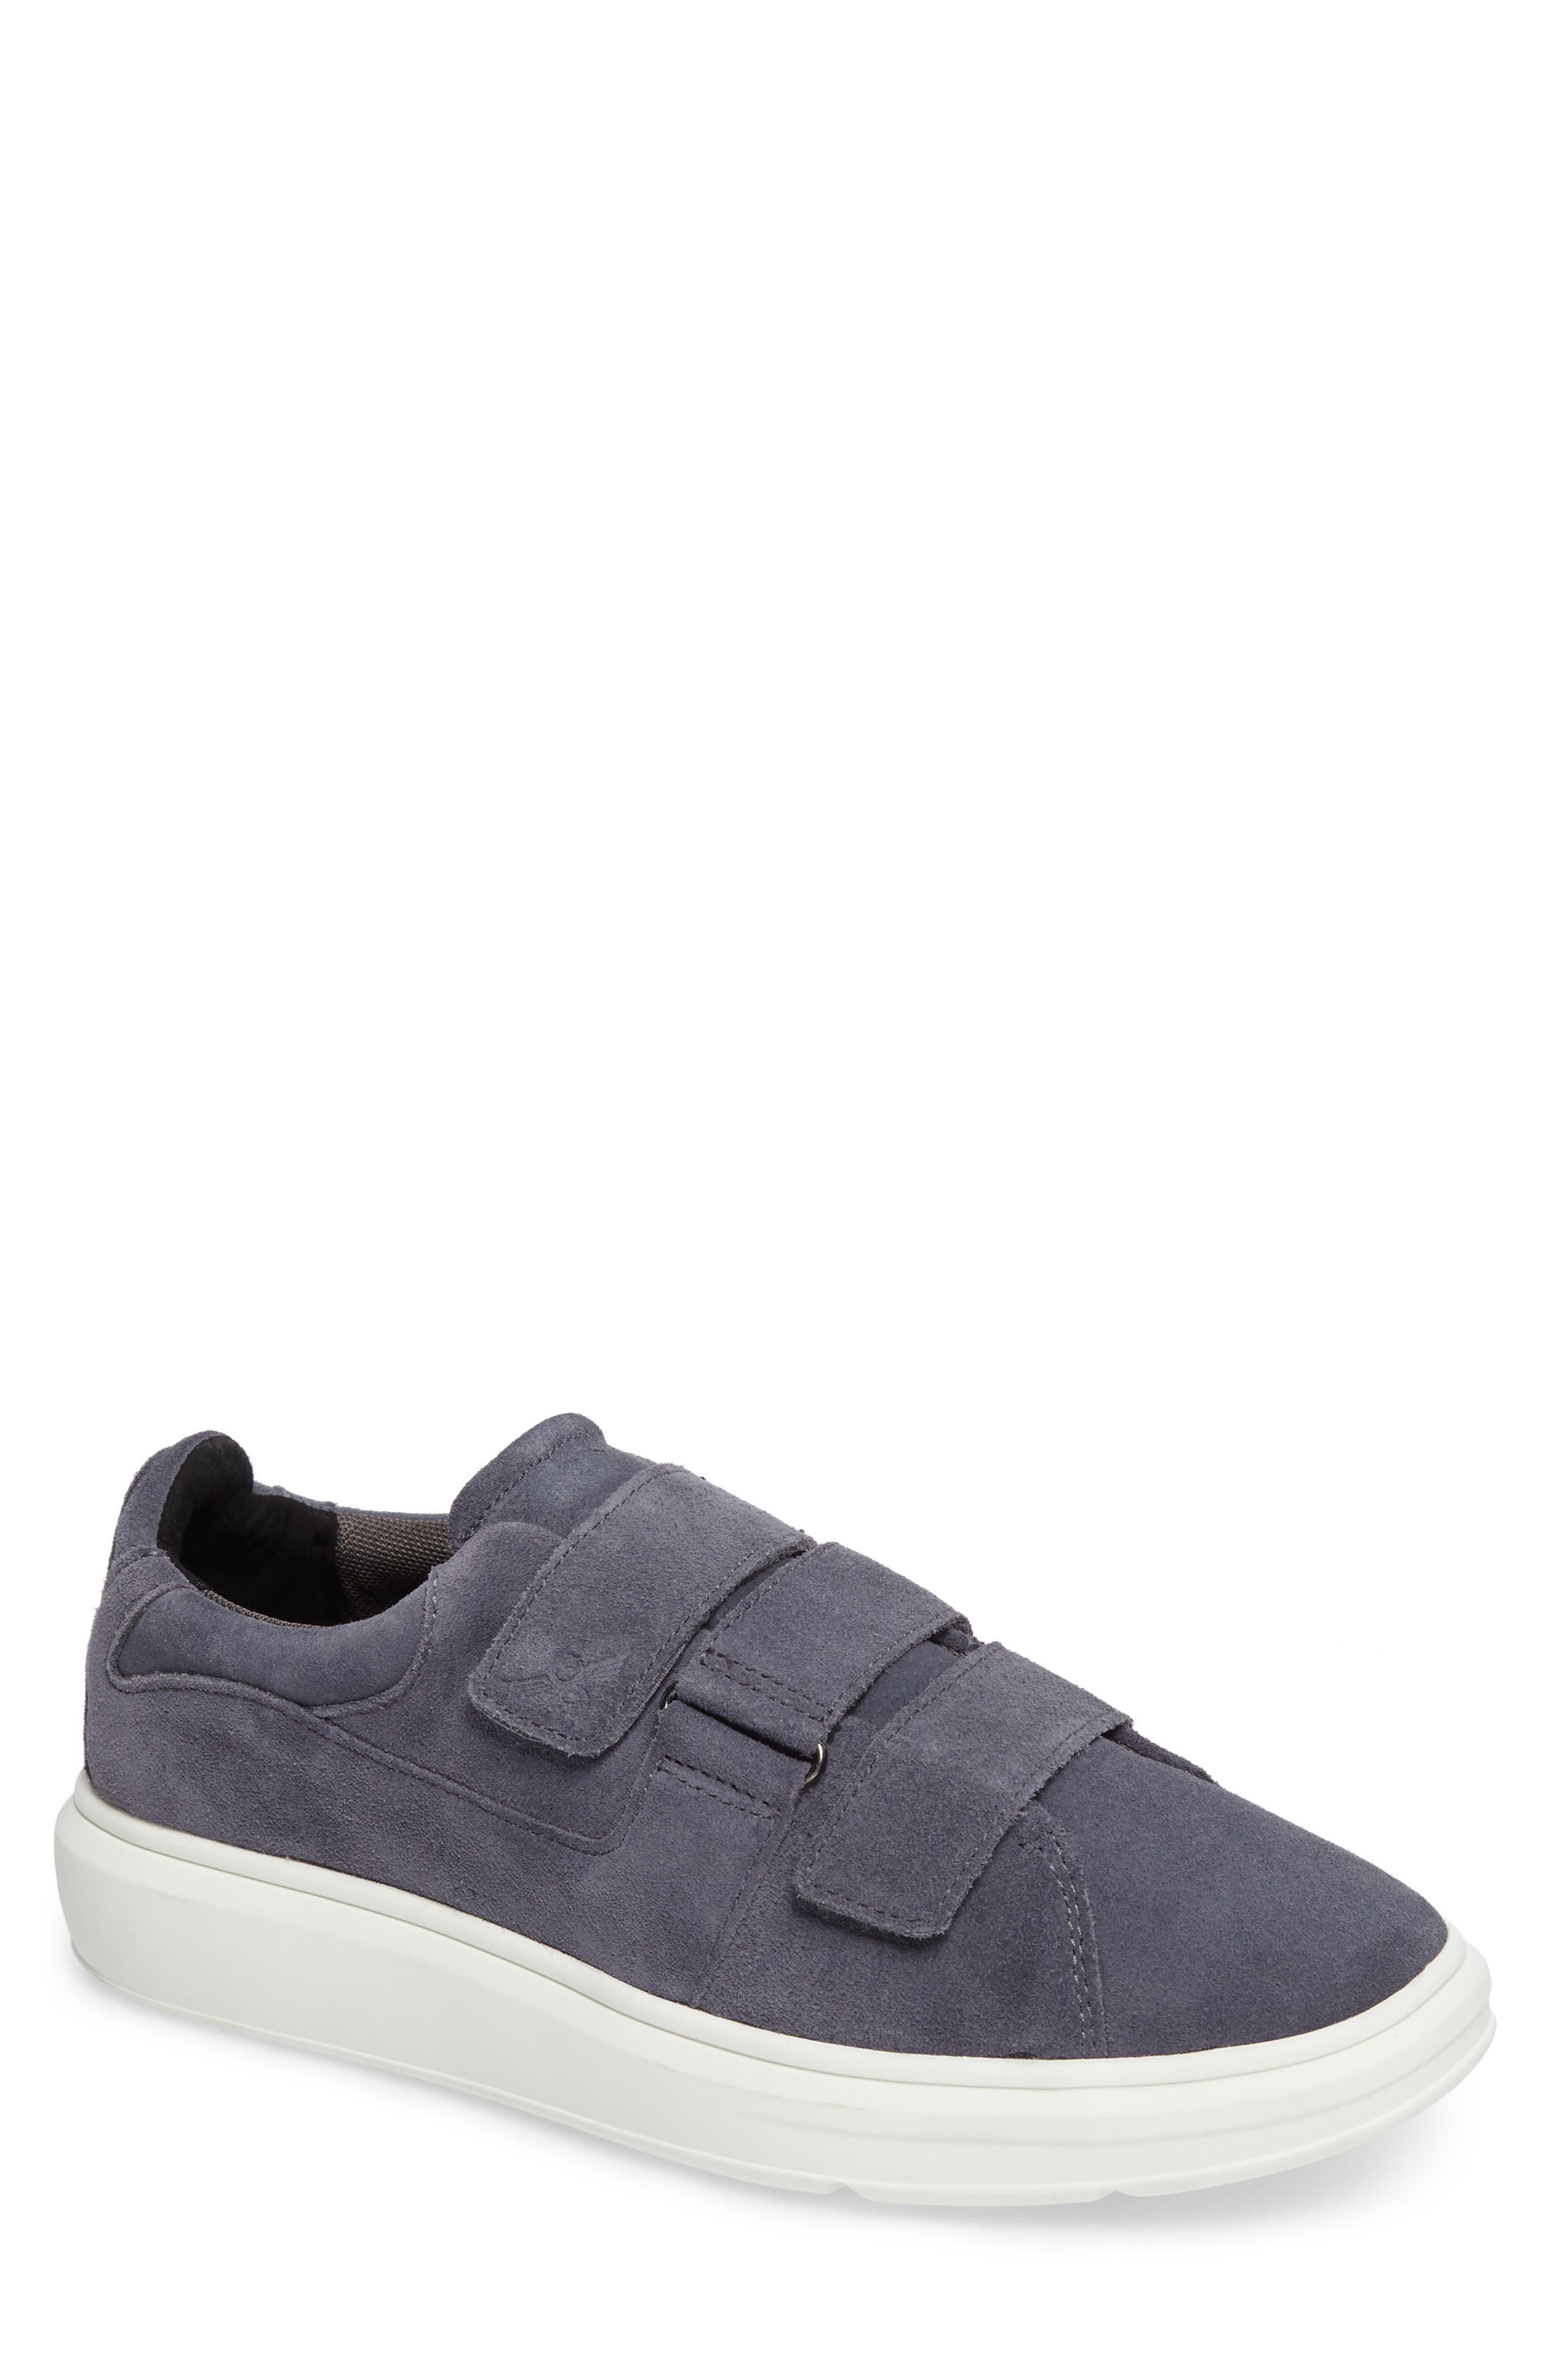 Alternate Image 1 Selected - Creative Recreation Meleti Sneaker (Men)